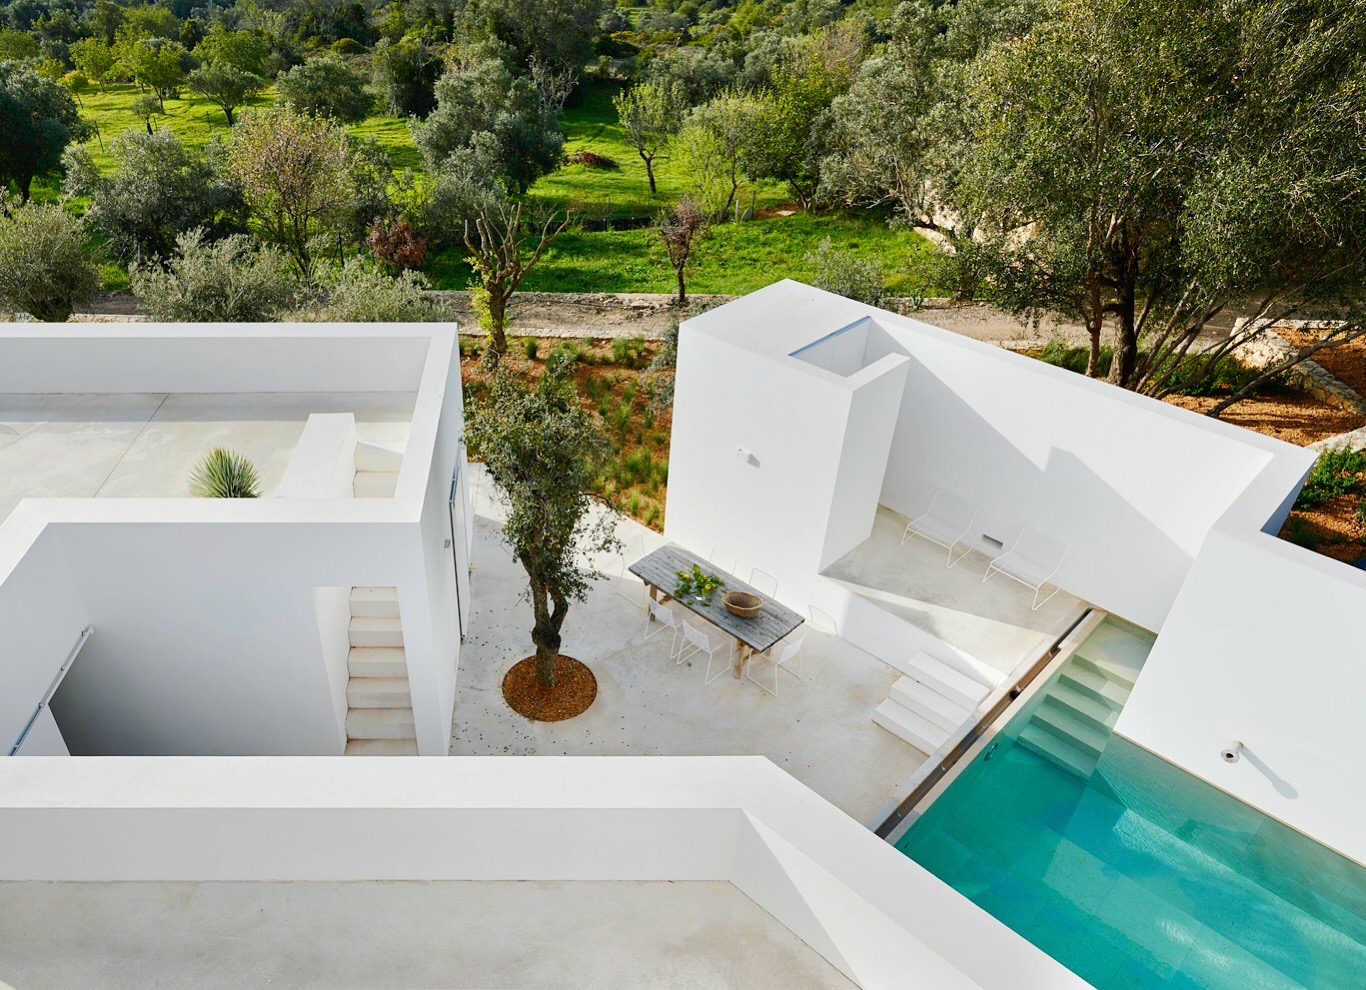 Zalig-Algarve-Casa-Luum-156-1